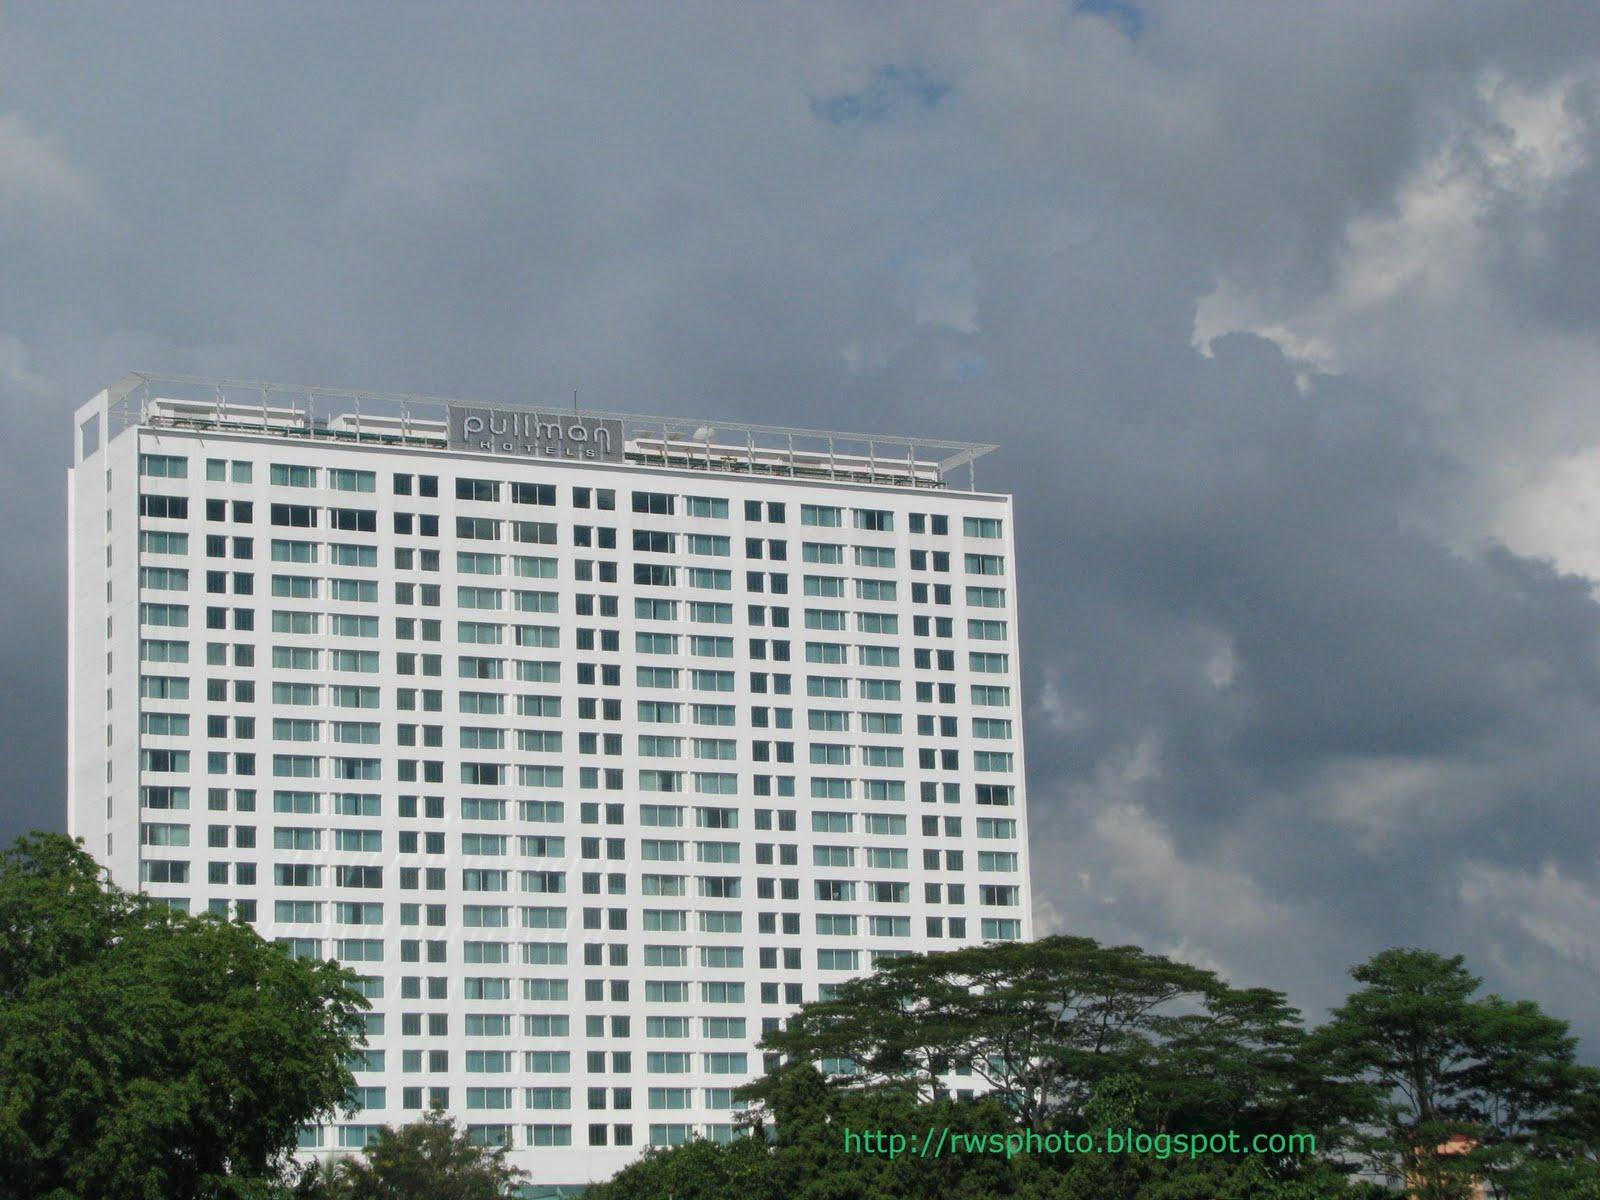 Pullman Hotel Kuching - RWS Photo Blog - Splendour ...